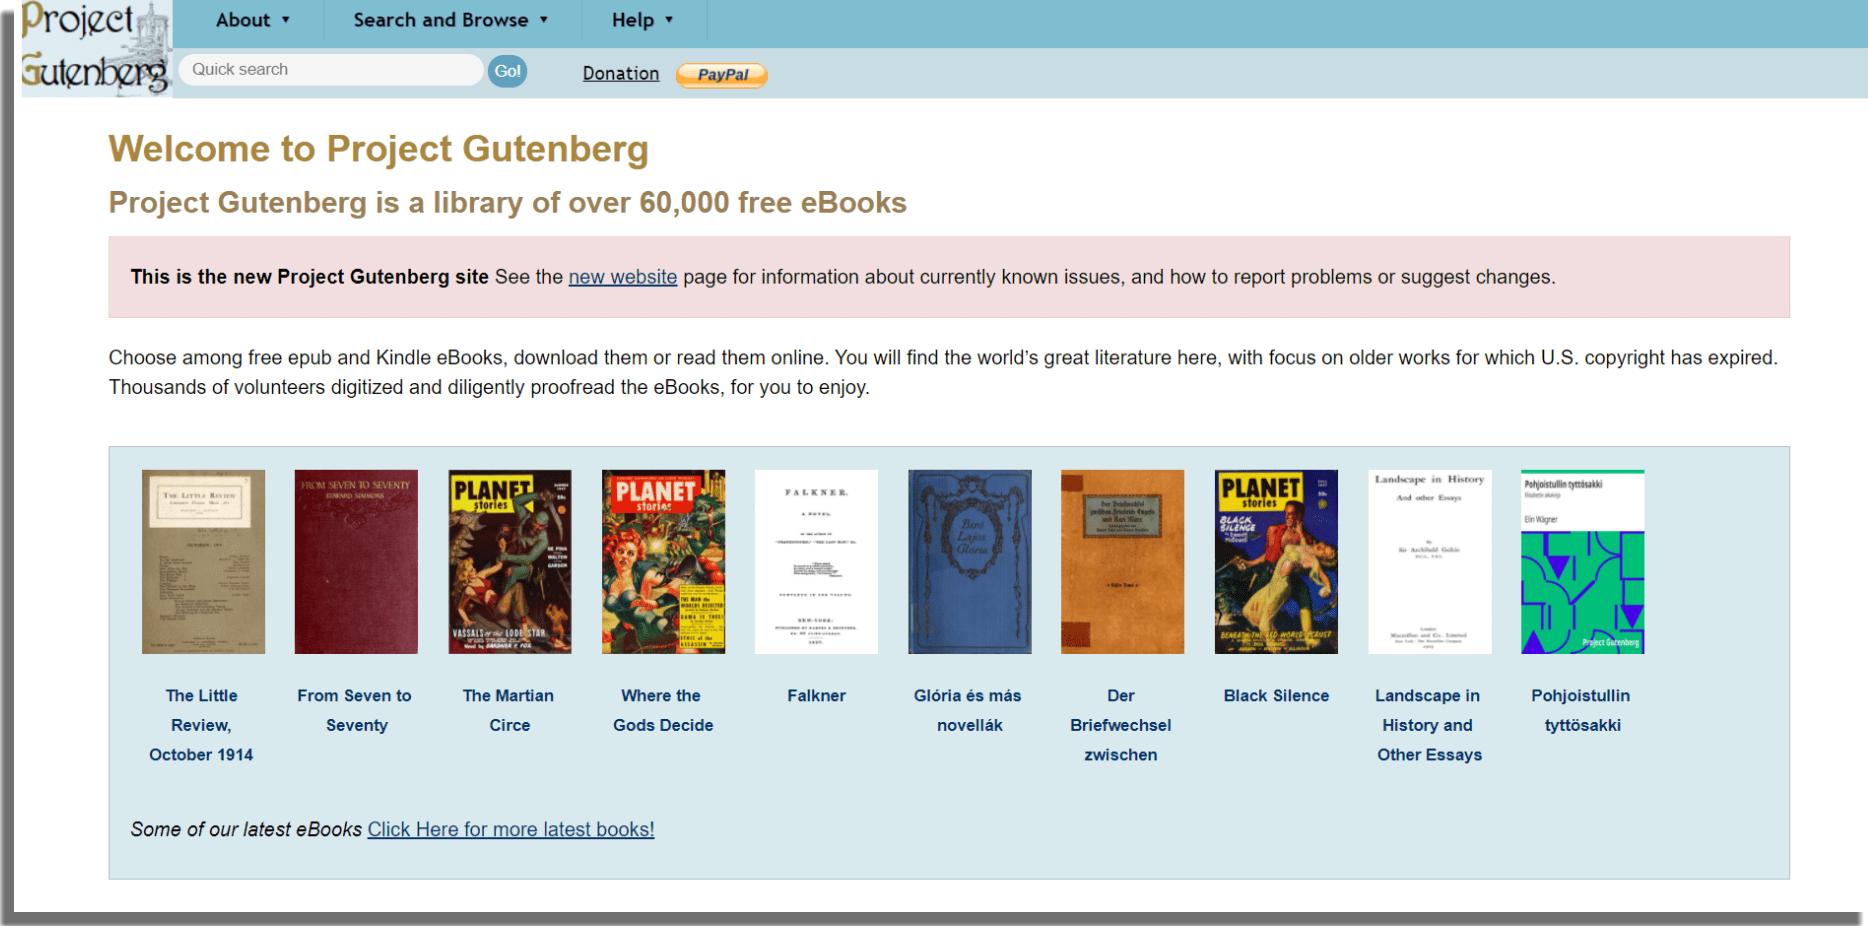 Proyecto Gutenberg ebooks